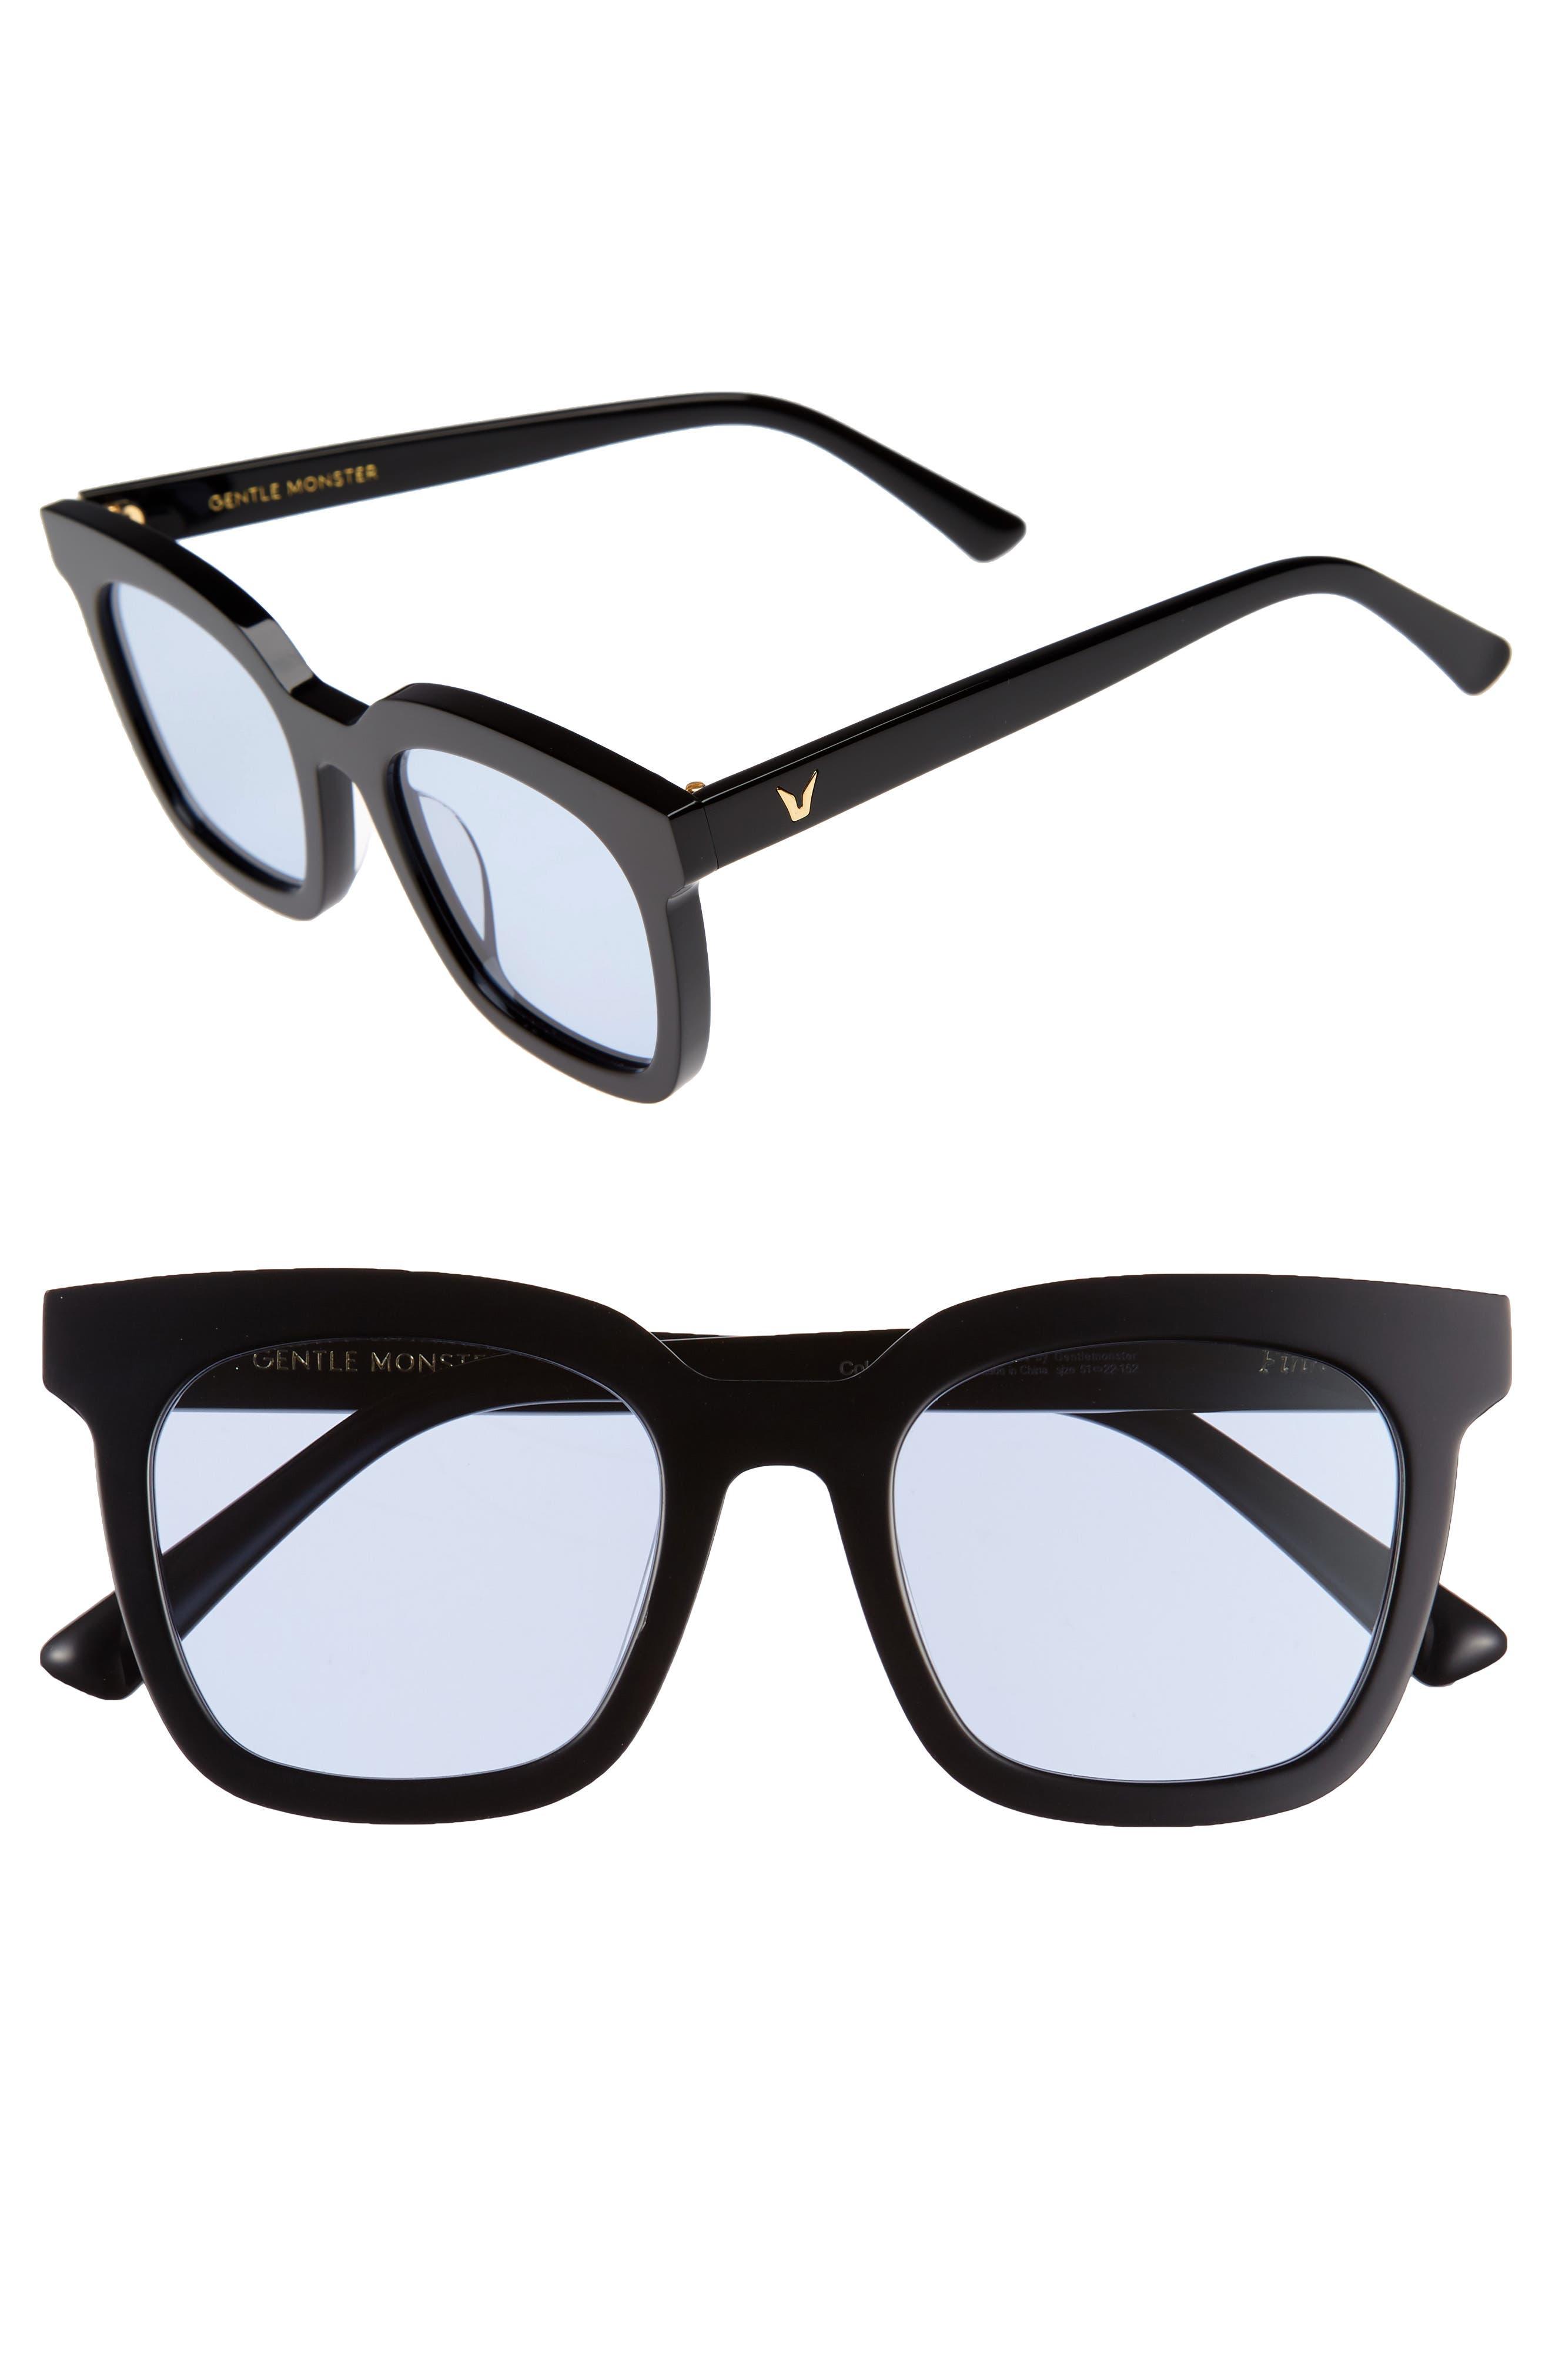 Finn 51mm Sunglasses,                         Main,                         color, 001